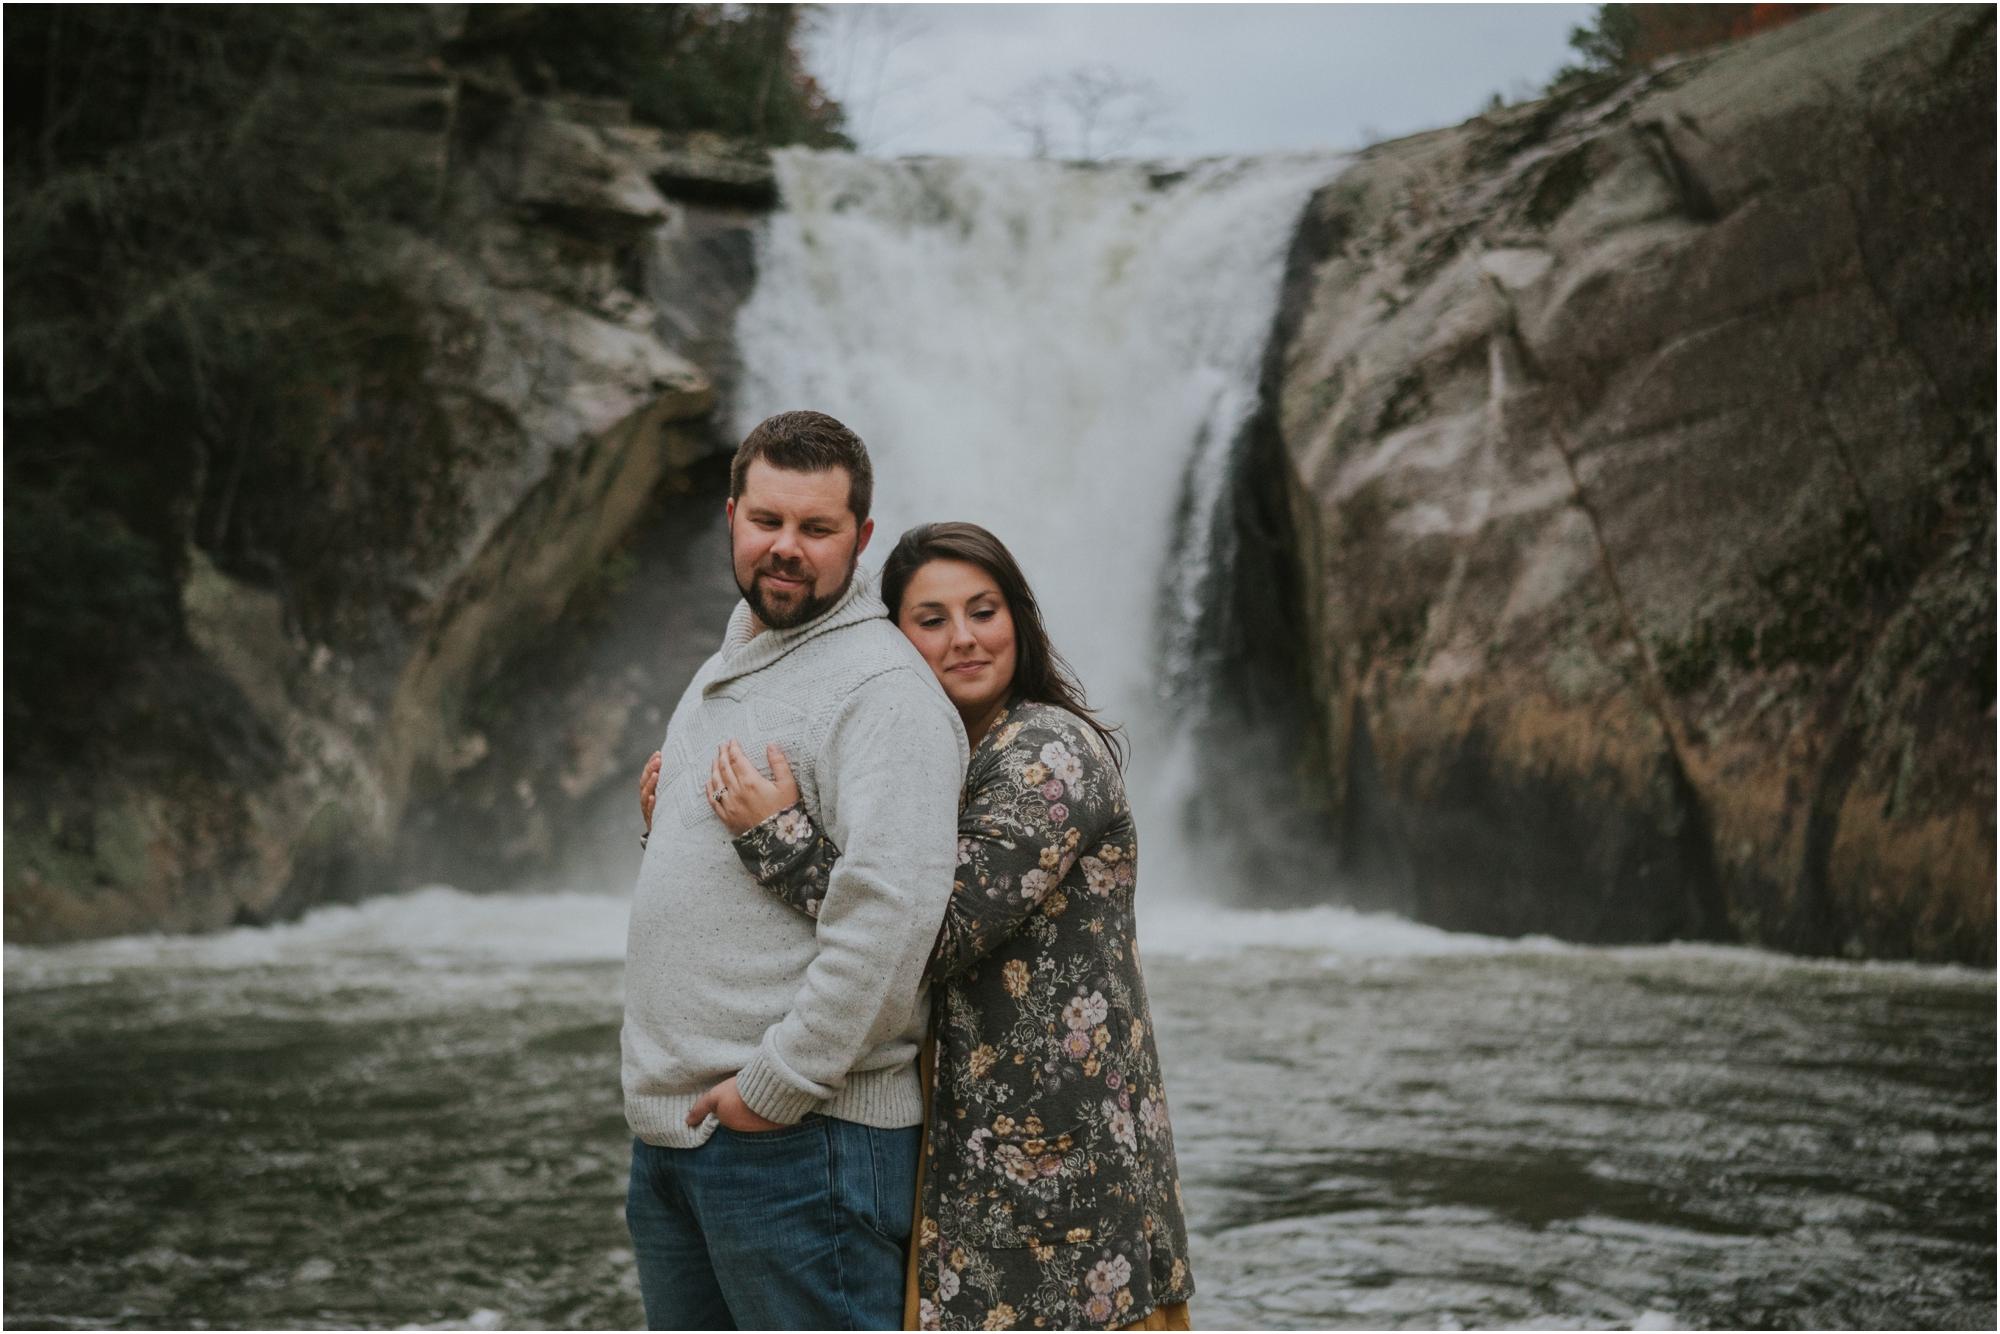 katy-sergent-waterfall-engagment-intimate-wedding-elopement-tennessee-elk-river-falls-session-adventurous-couples-johnson-city-tn-photographer-photography_0028.jpg